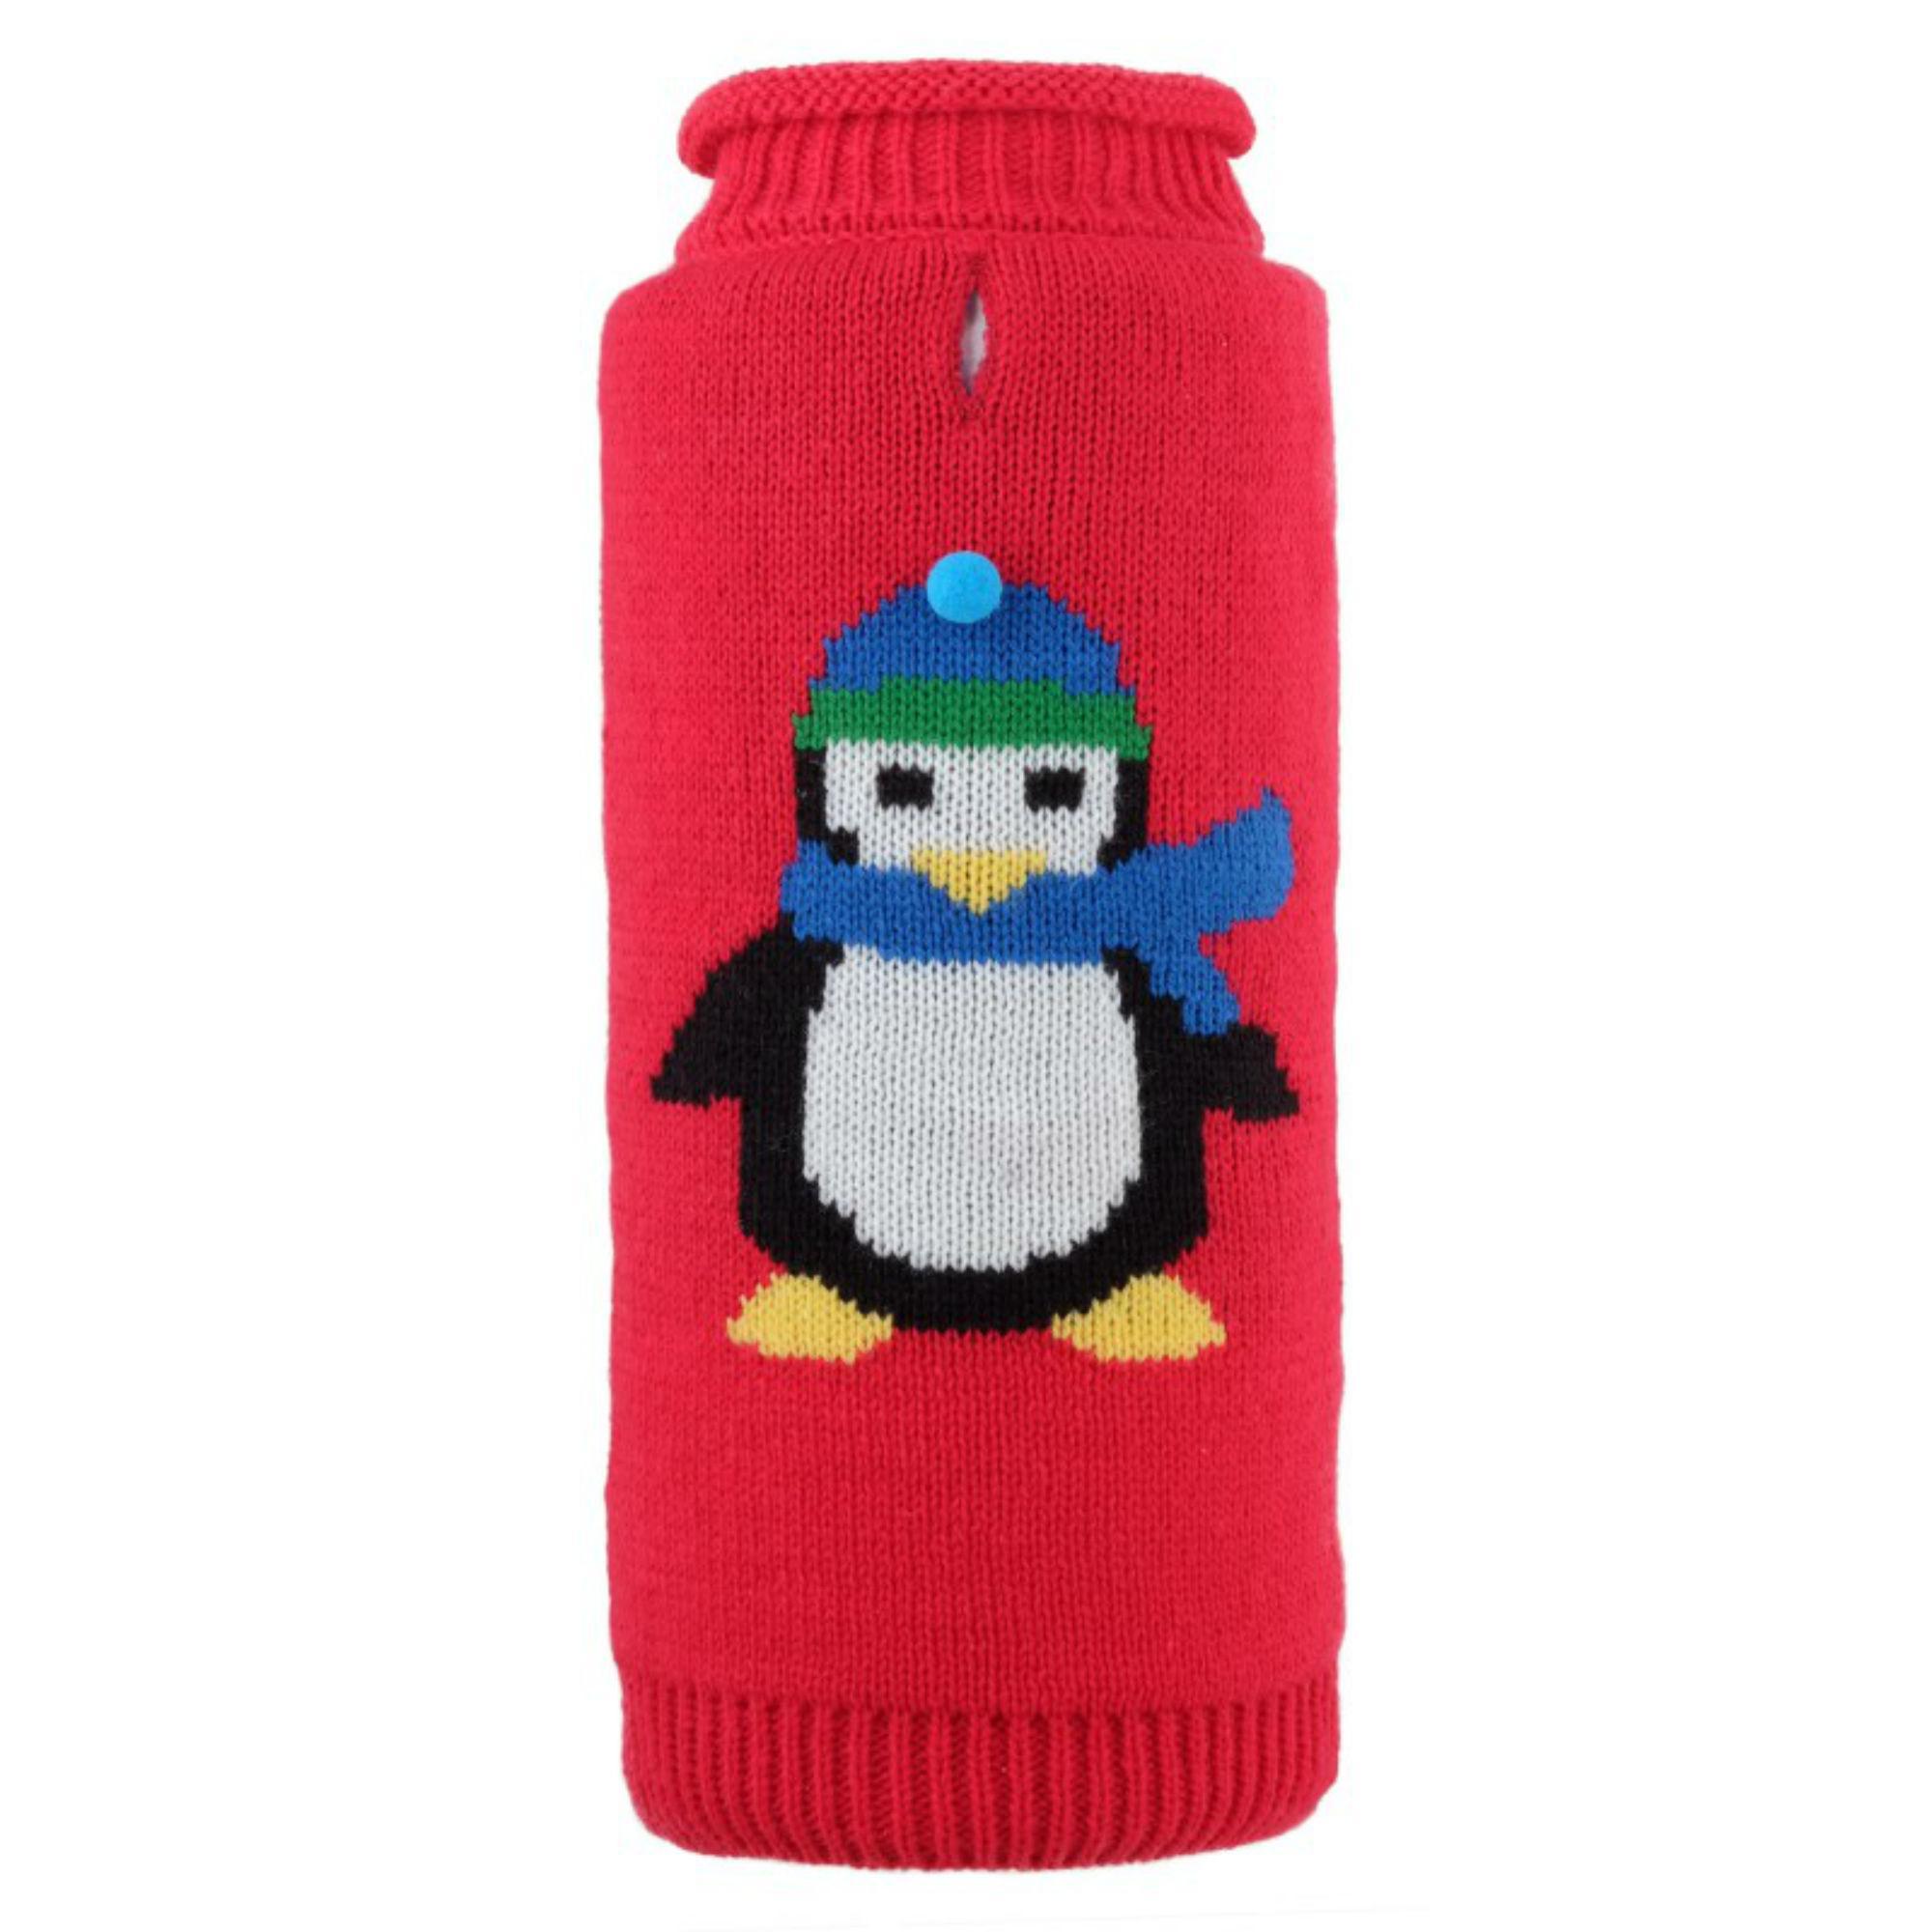 Worthy Dog Petey The Penguin Dog Sweater - Red